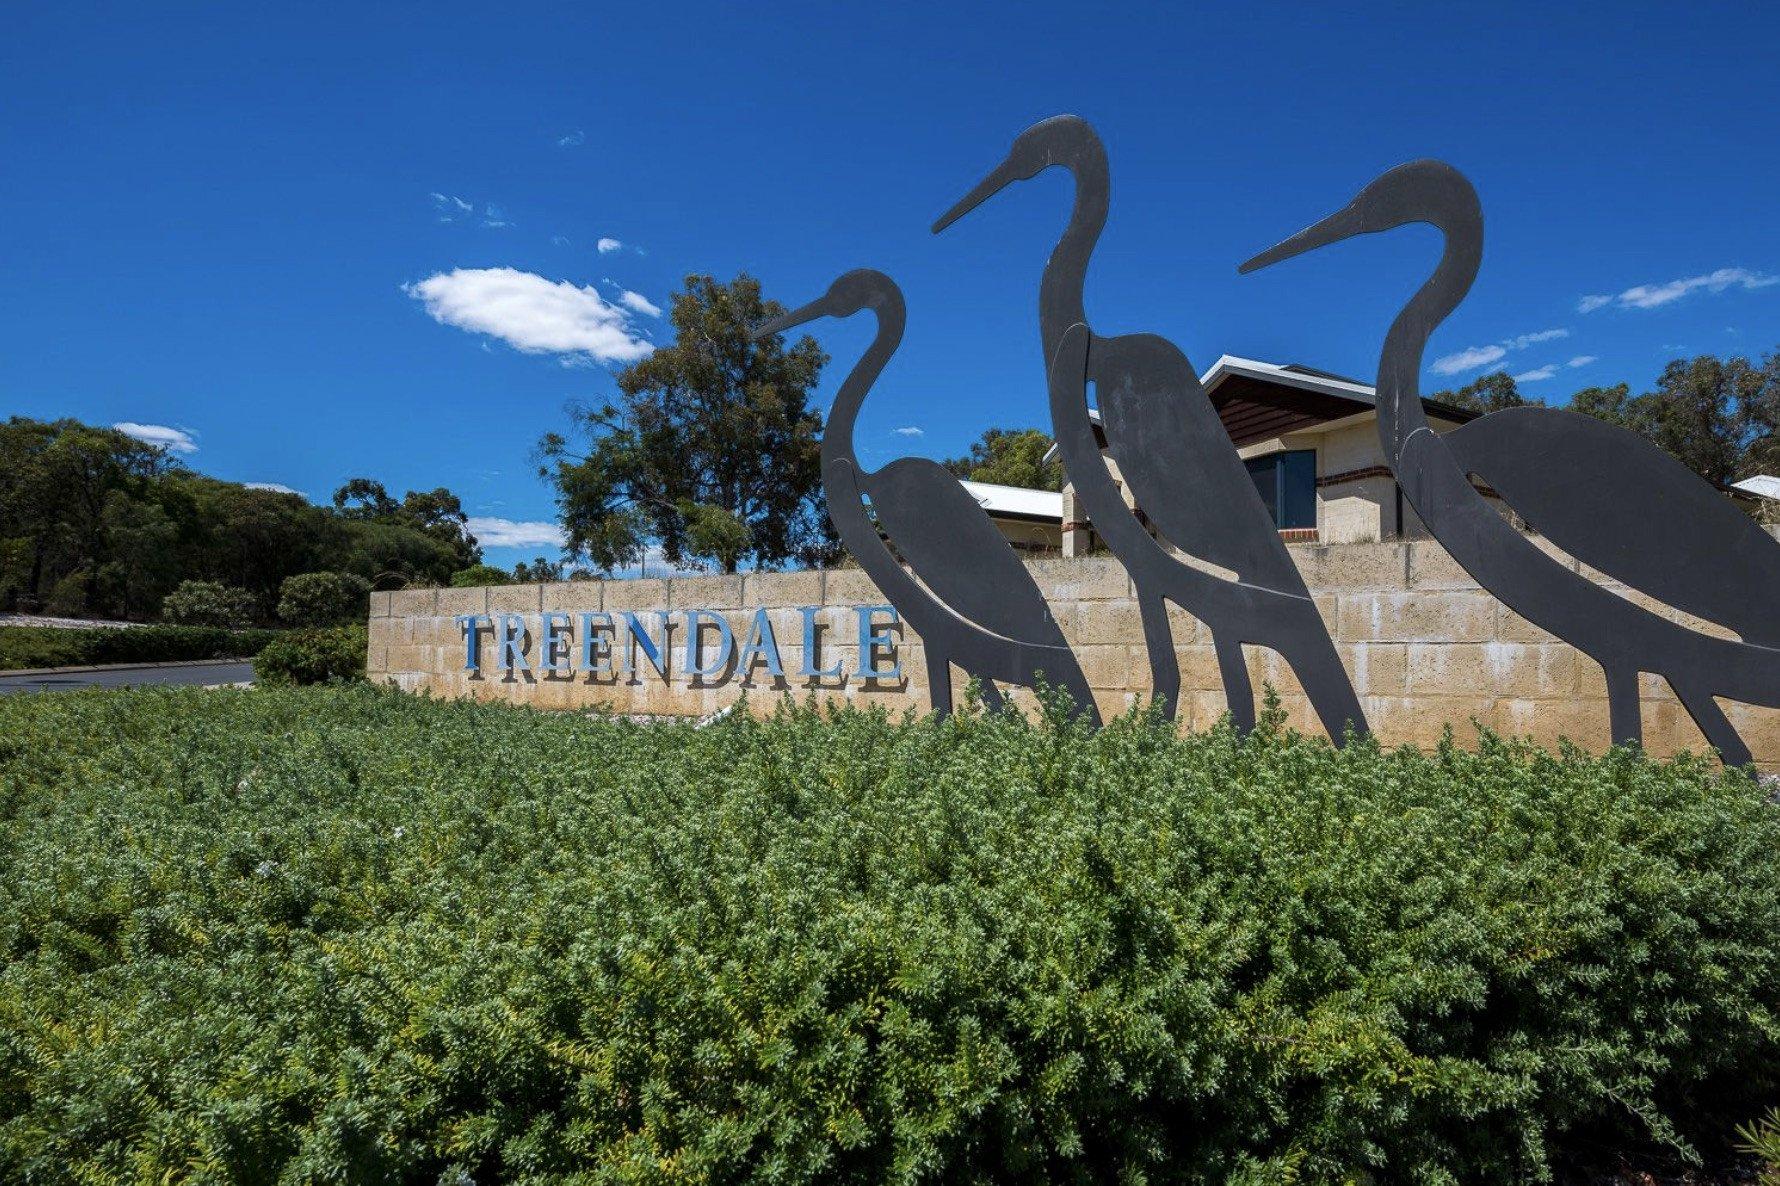 Treendale-1